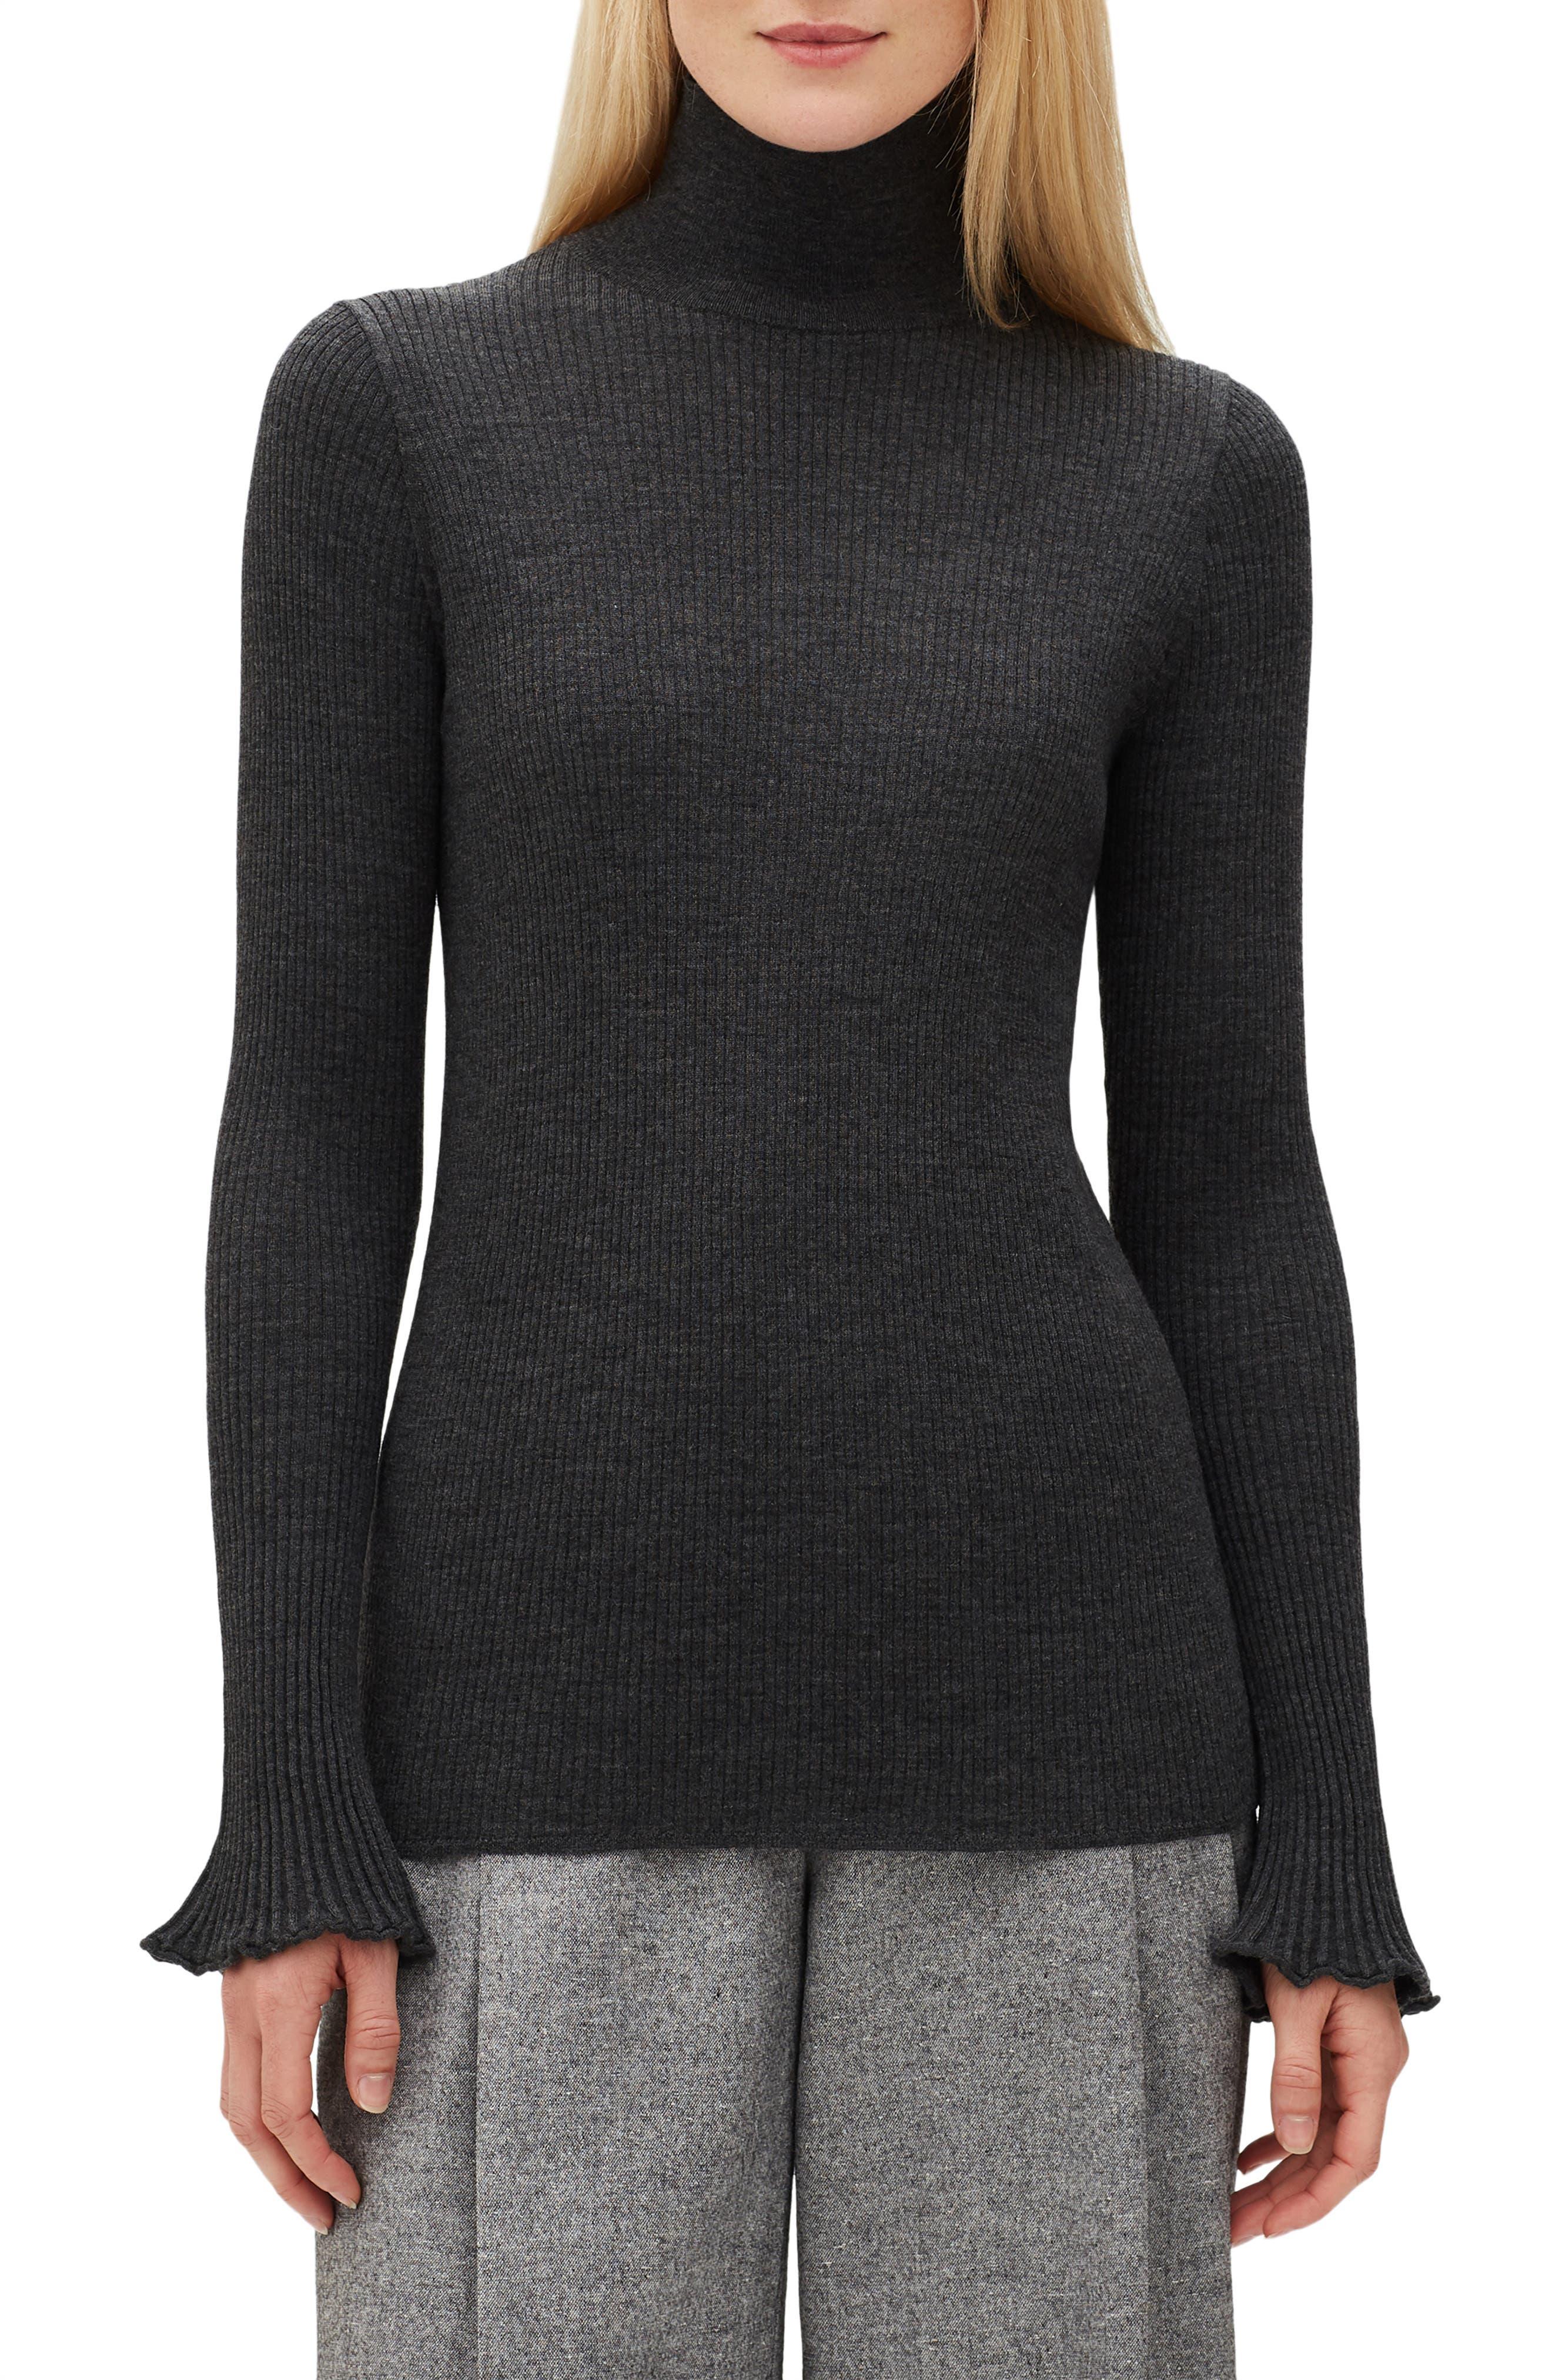 Lafayette 148 New York Rib Knit Merino Wool Sweater, Grey